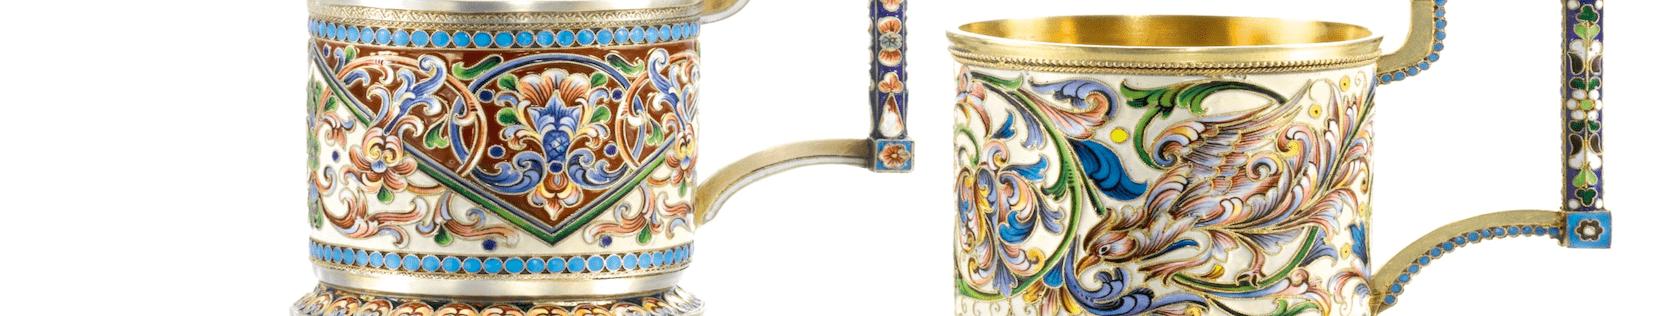 antique cup holder